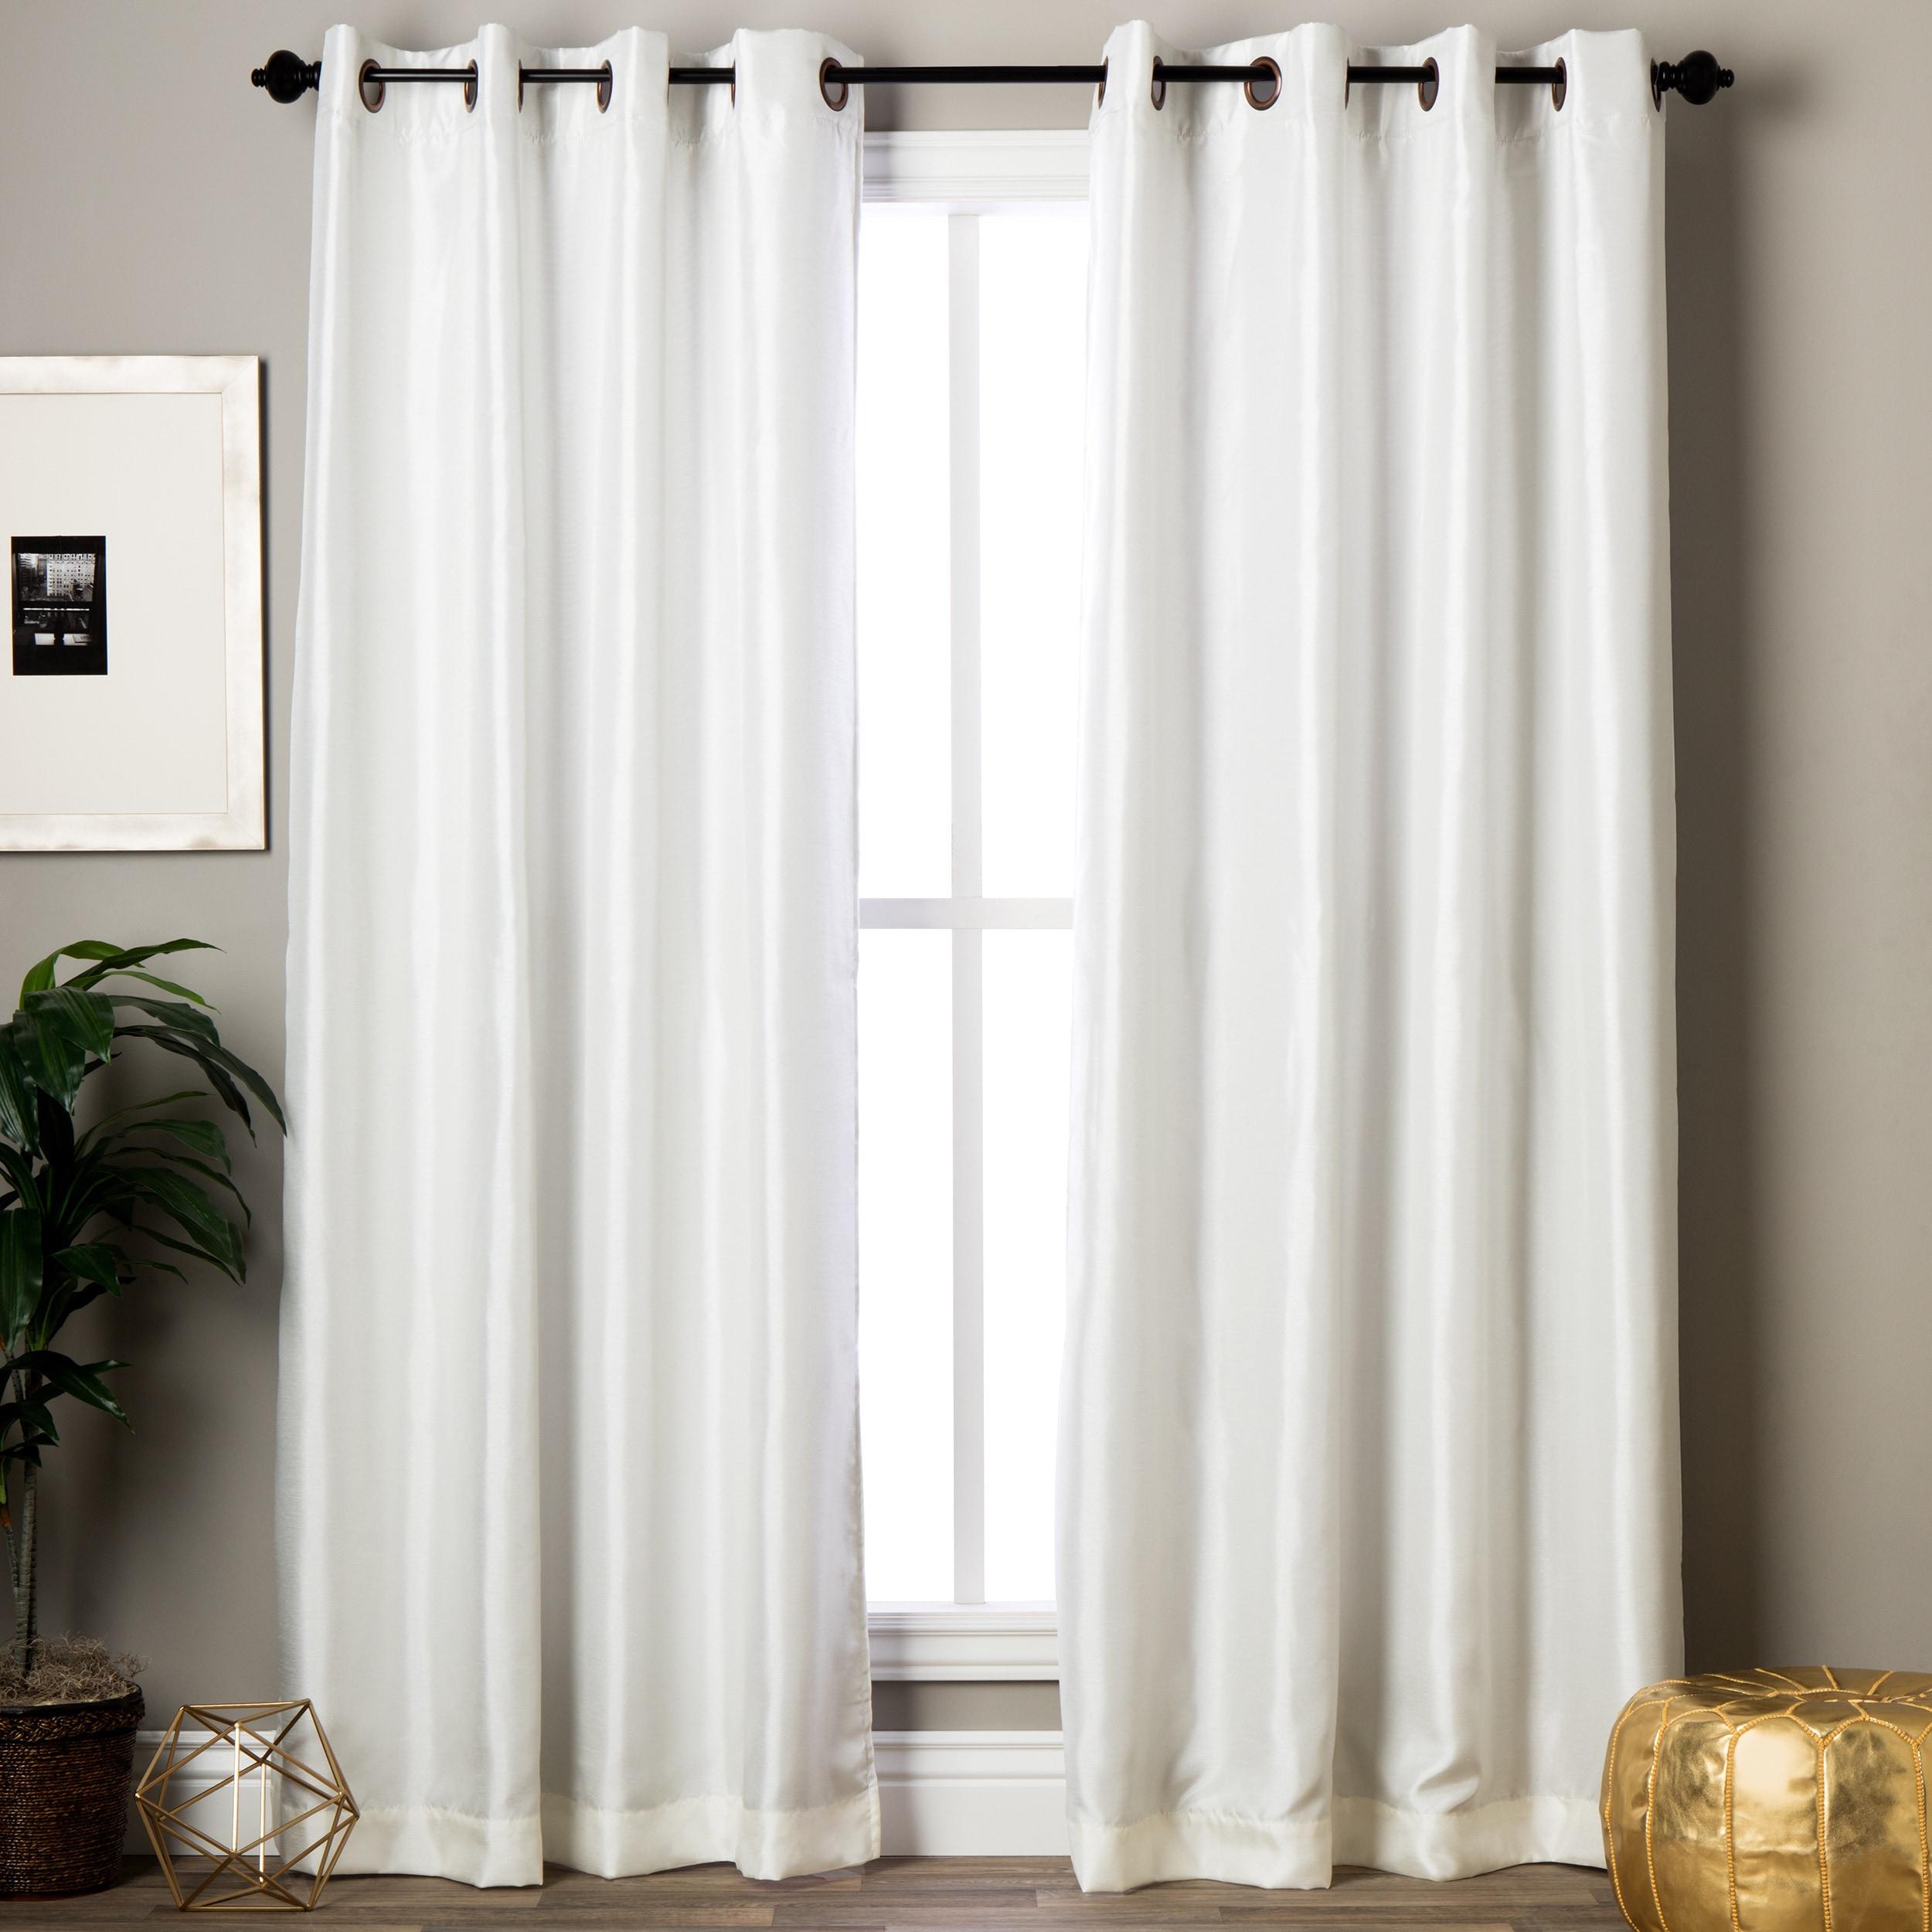 walmart curtain curtains mainstays rod inch set sailcloth panel com of ip